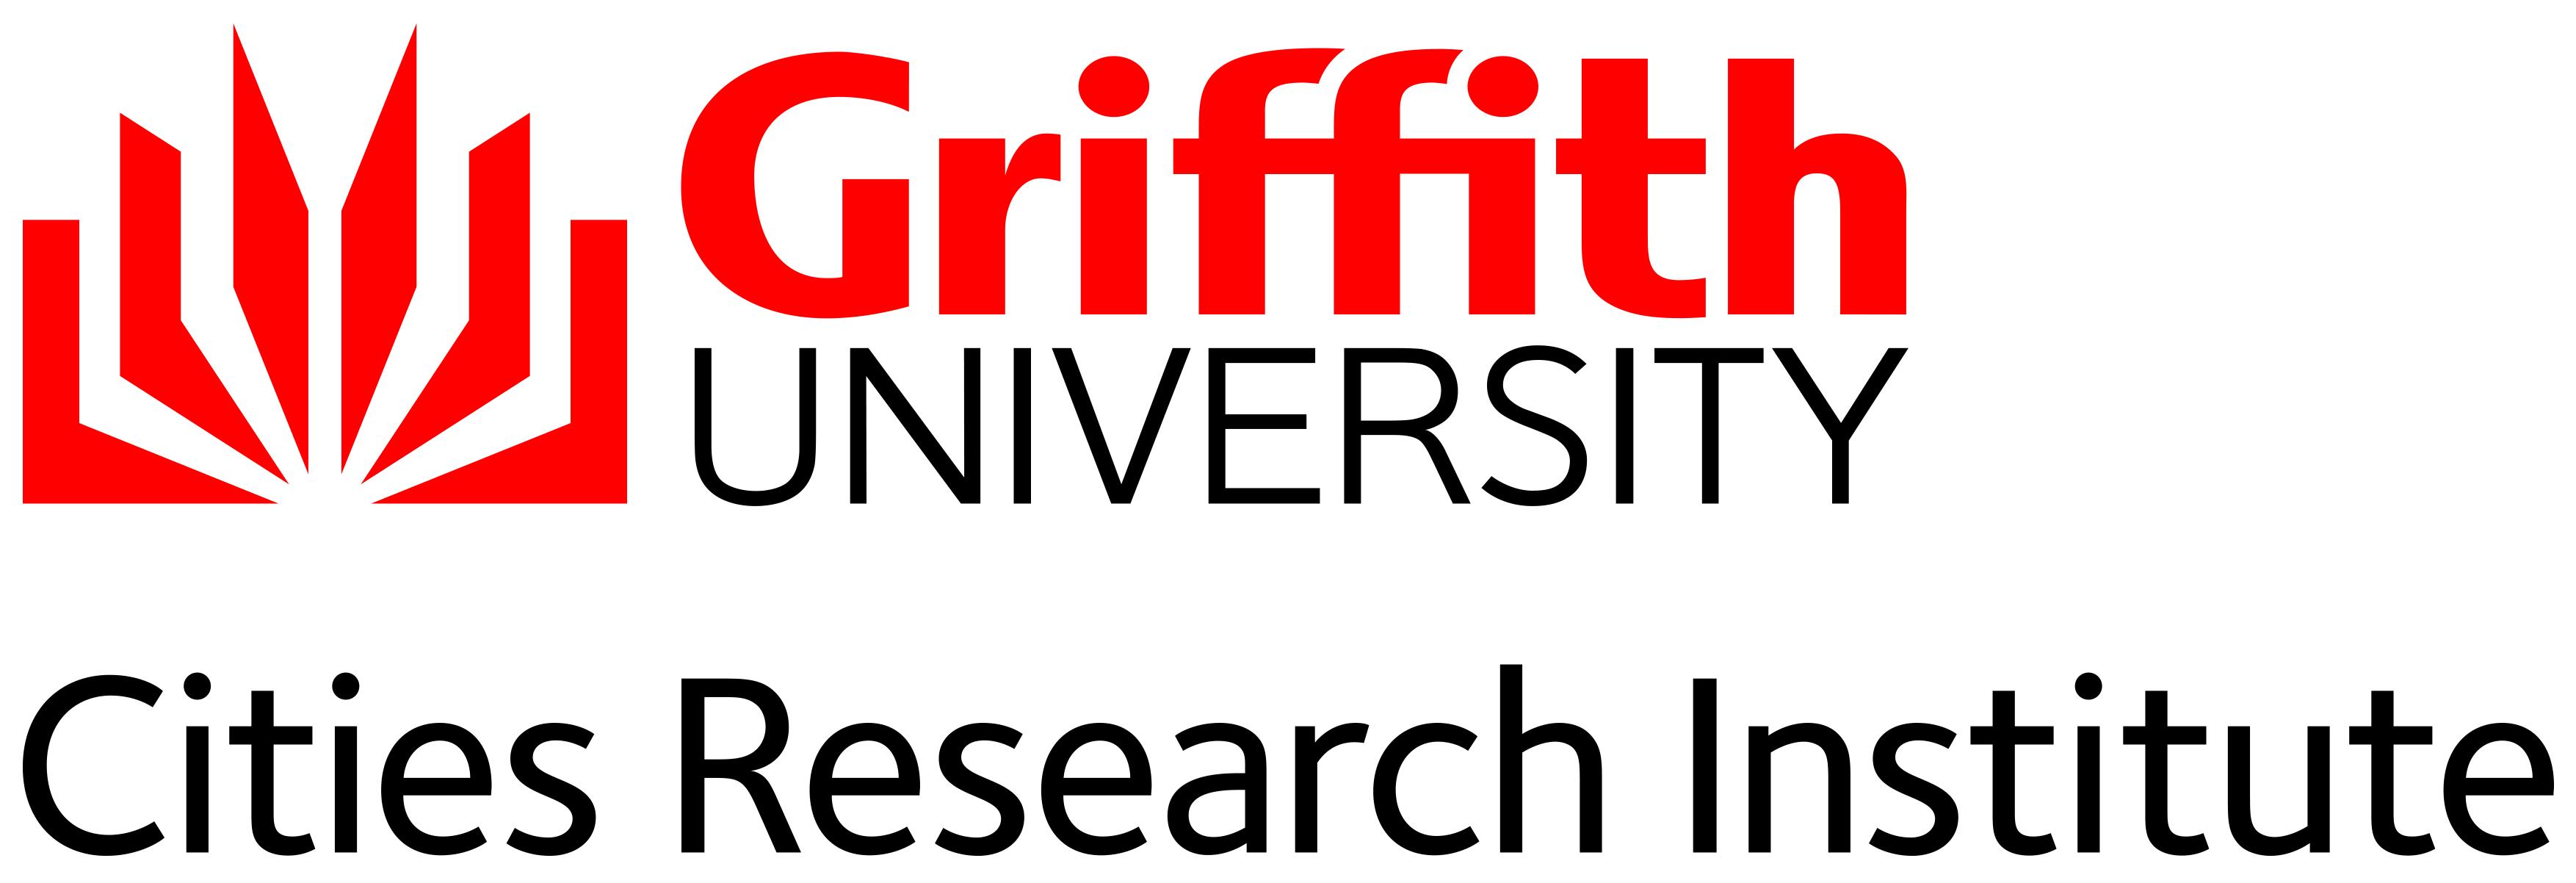 GU_Cities_Research_Institute_logo_CMYK